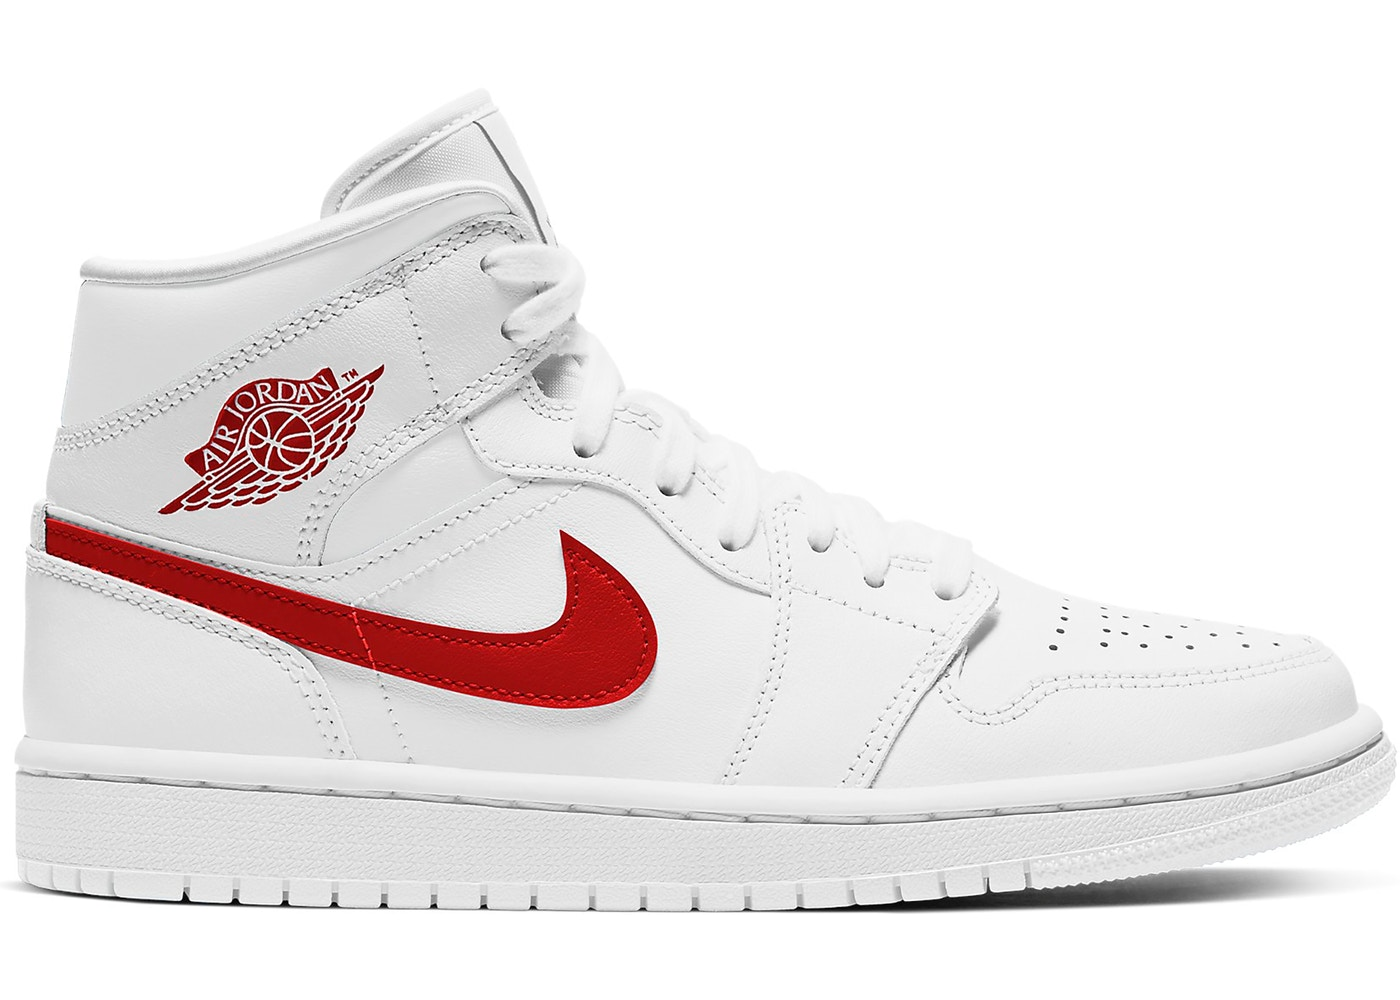 Jordan 1 Mid White University Red W Bq6472 106